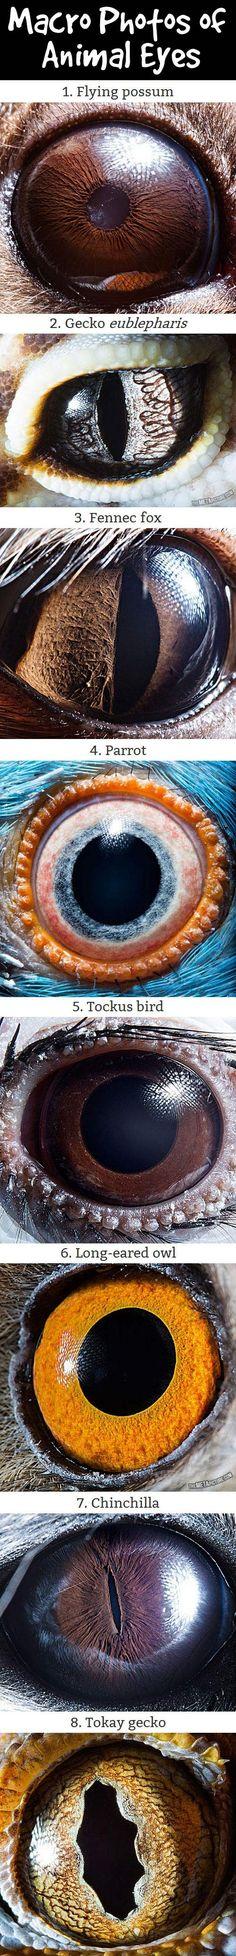 Macro photos of animal eyes.